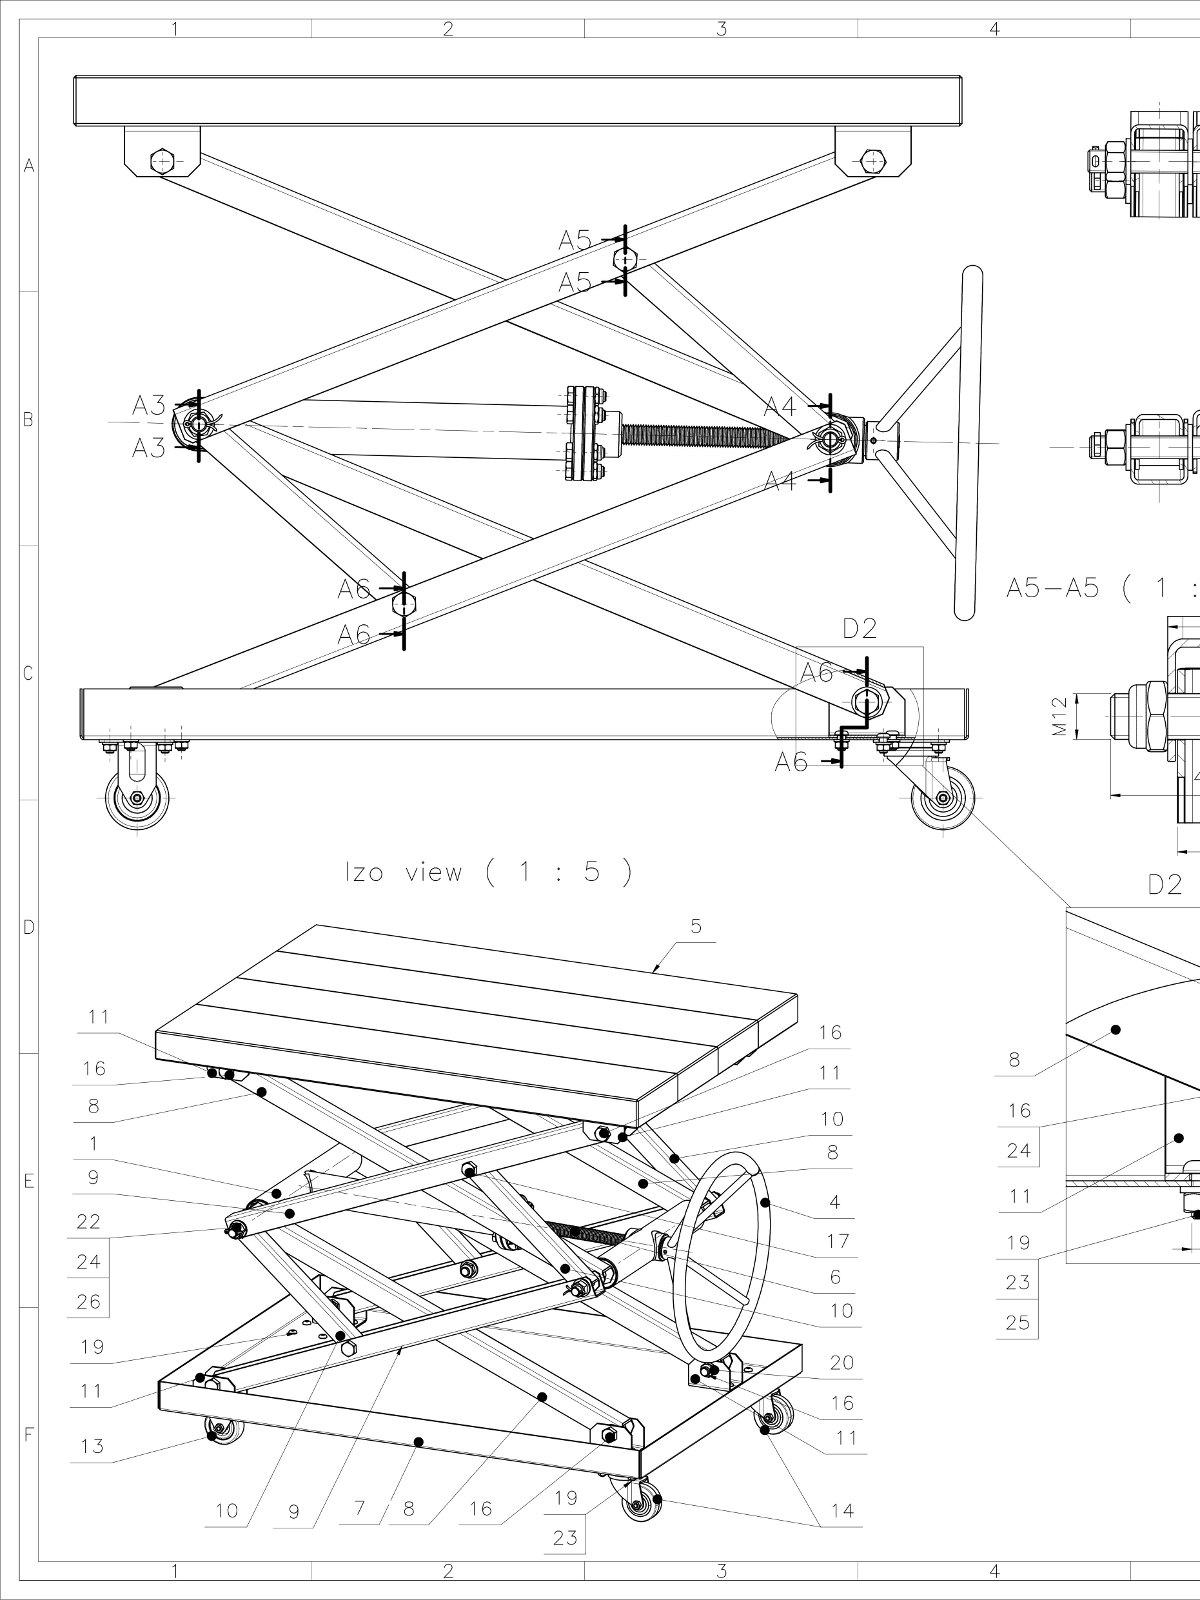 autodesk inventor 2017 manual pdf